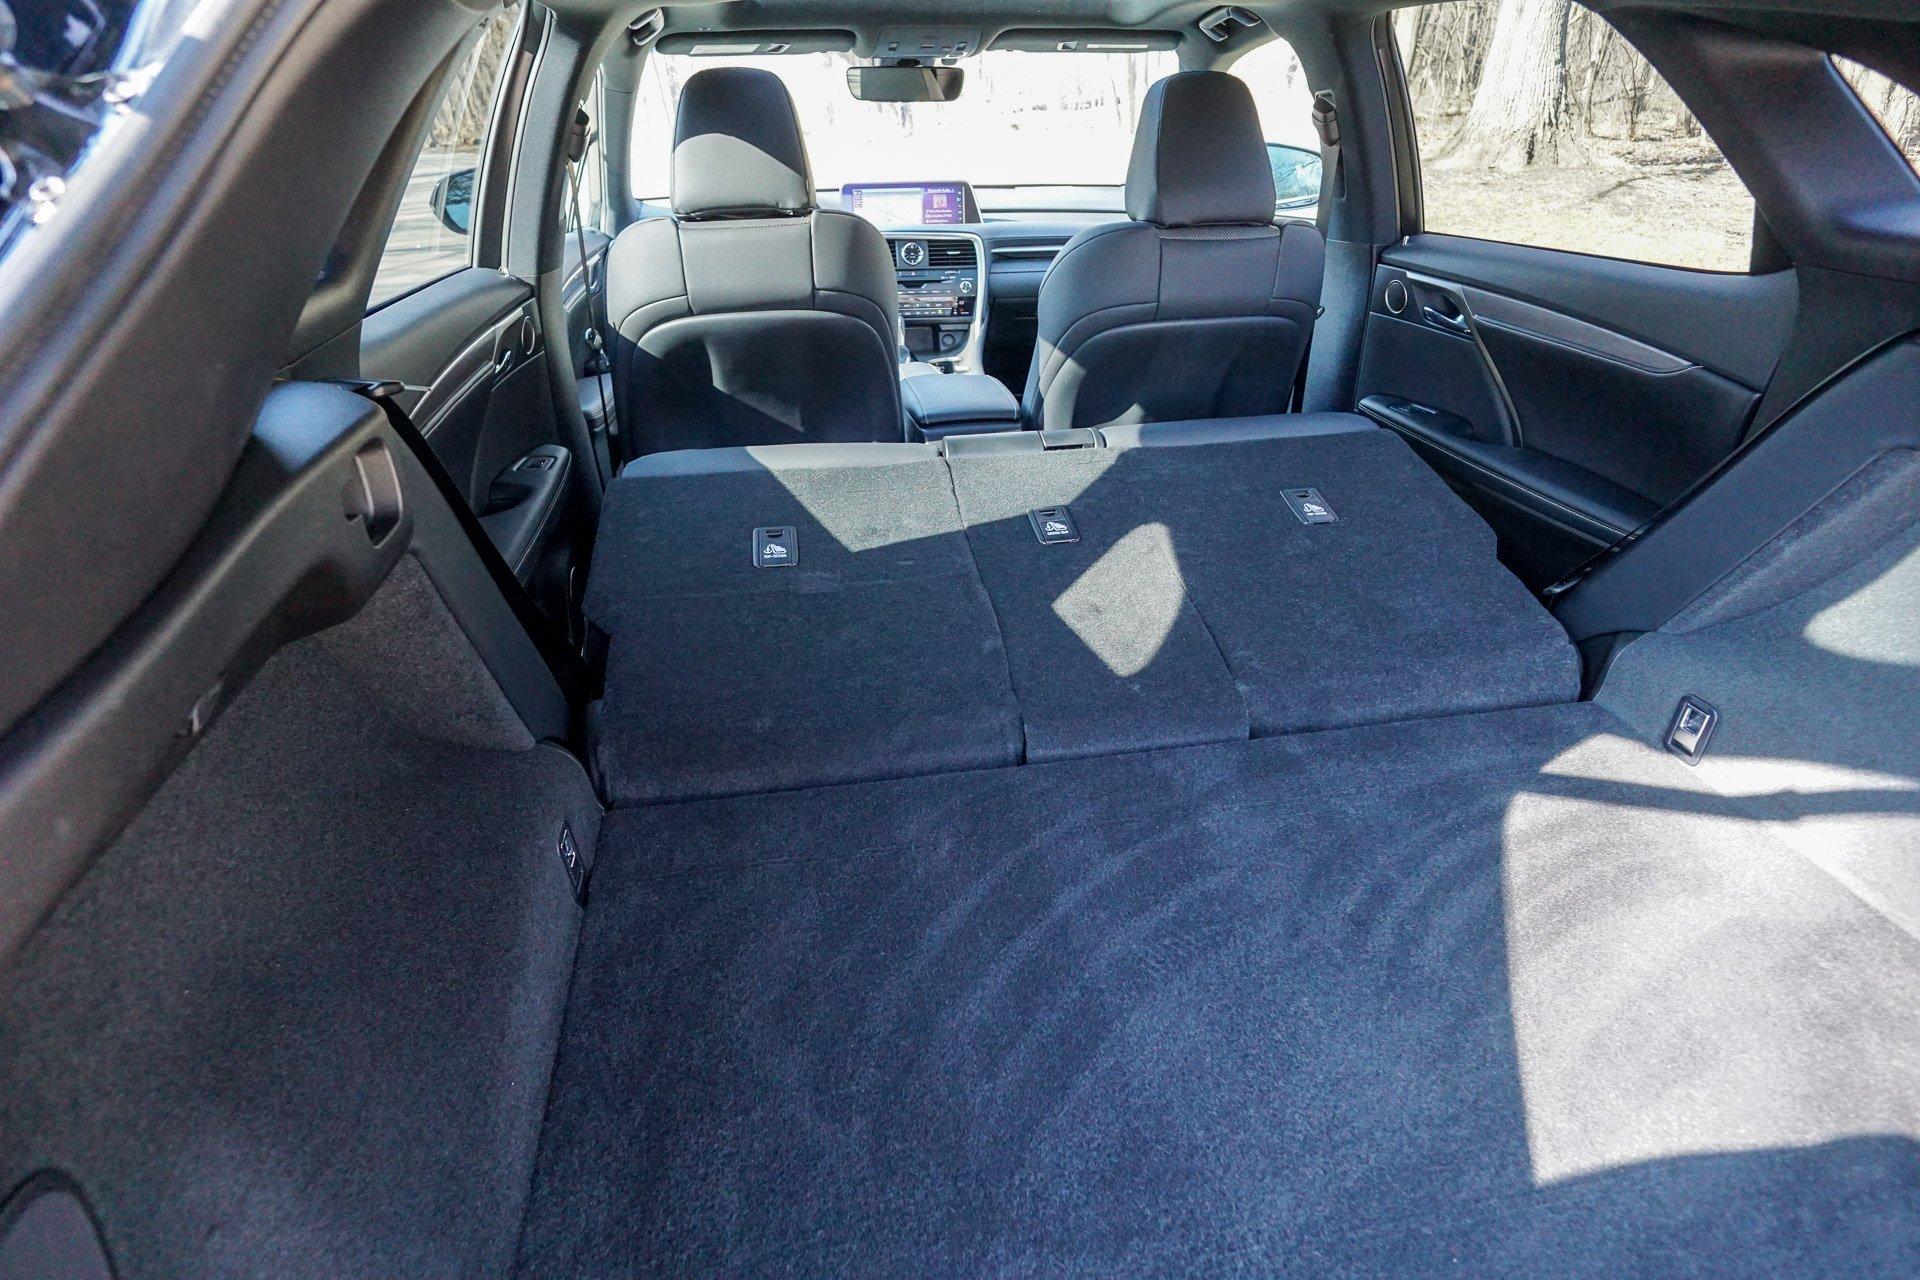 review 2016 lexus rx 350 f sport awd 95 octane. Black Bedroom Furniture Sets. Home Design Ideas